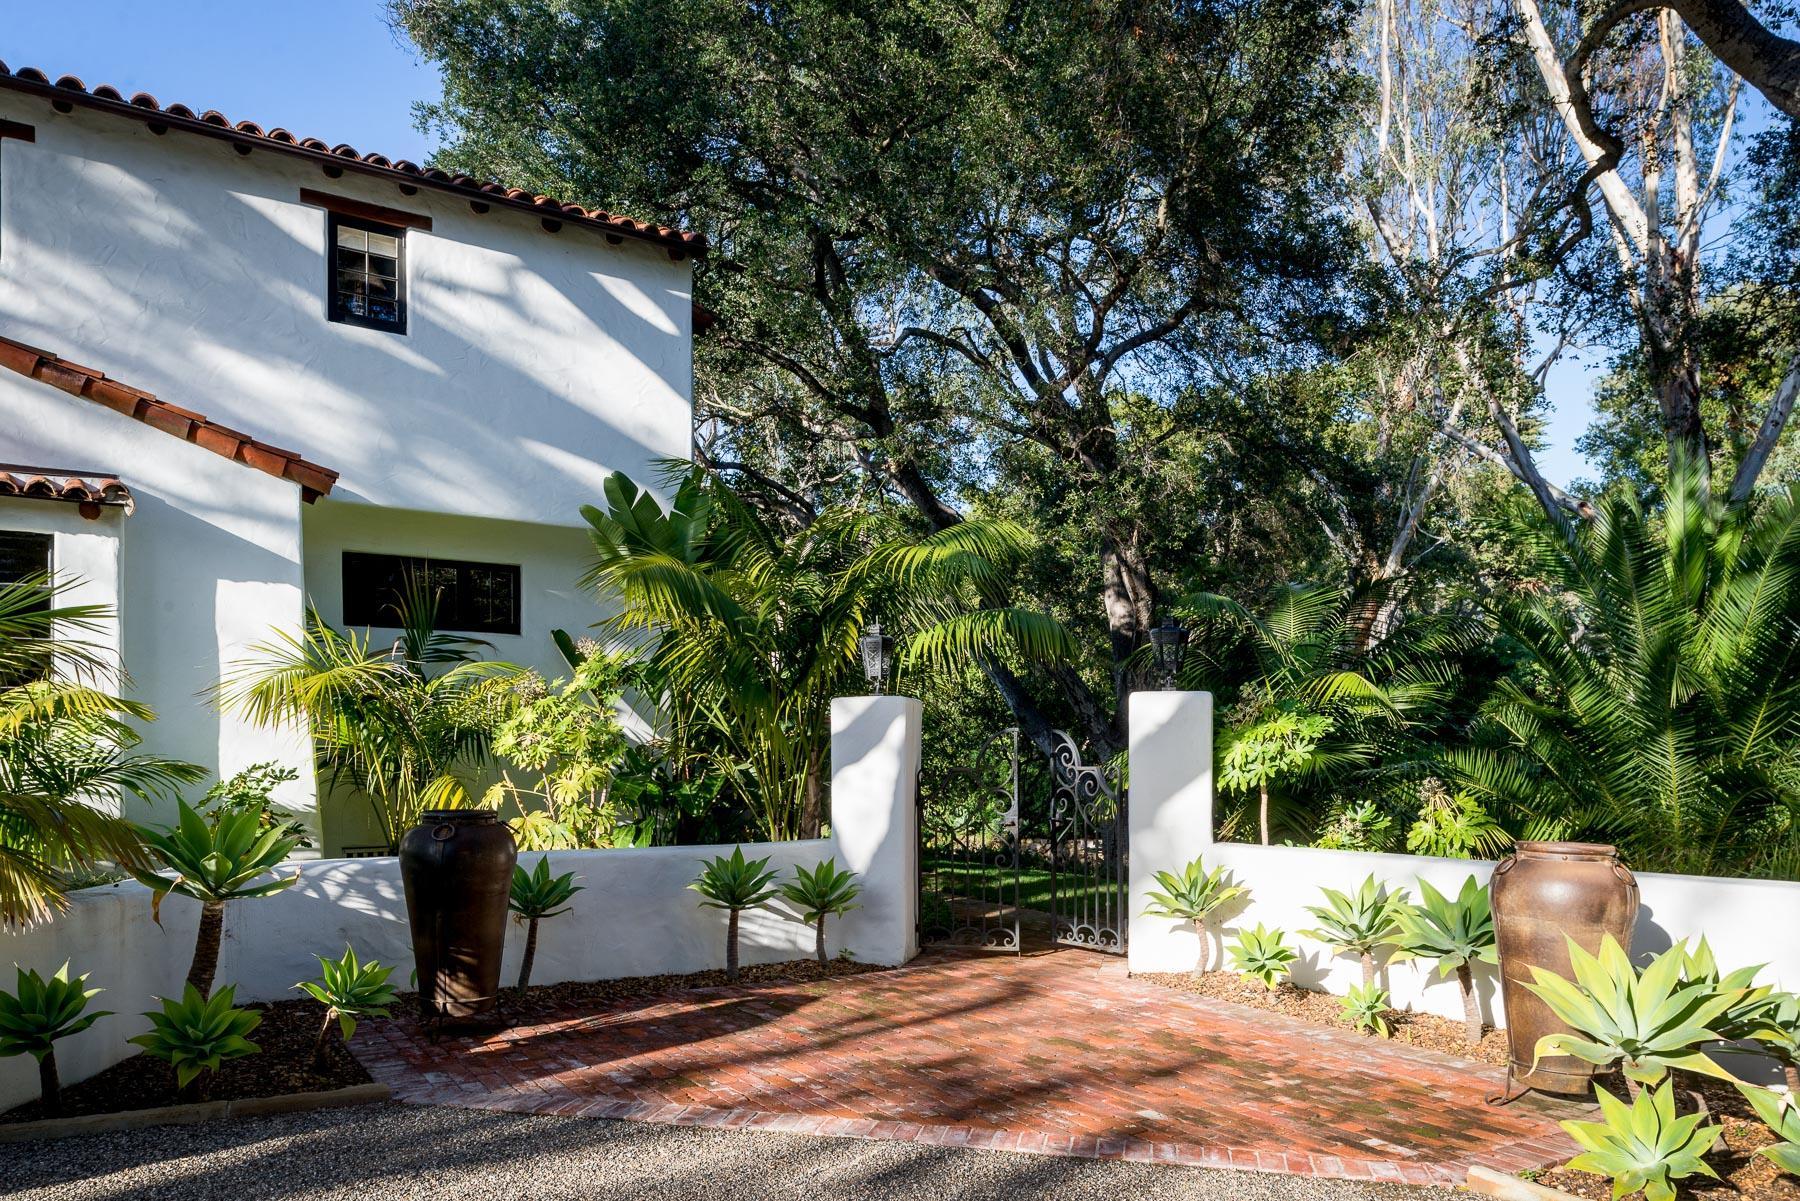 Property photo for 470 Hot Springs Rd Montecito, California 93108 - 16-582